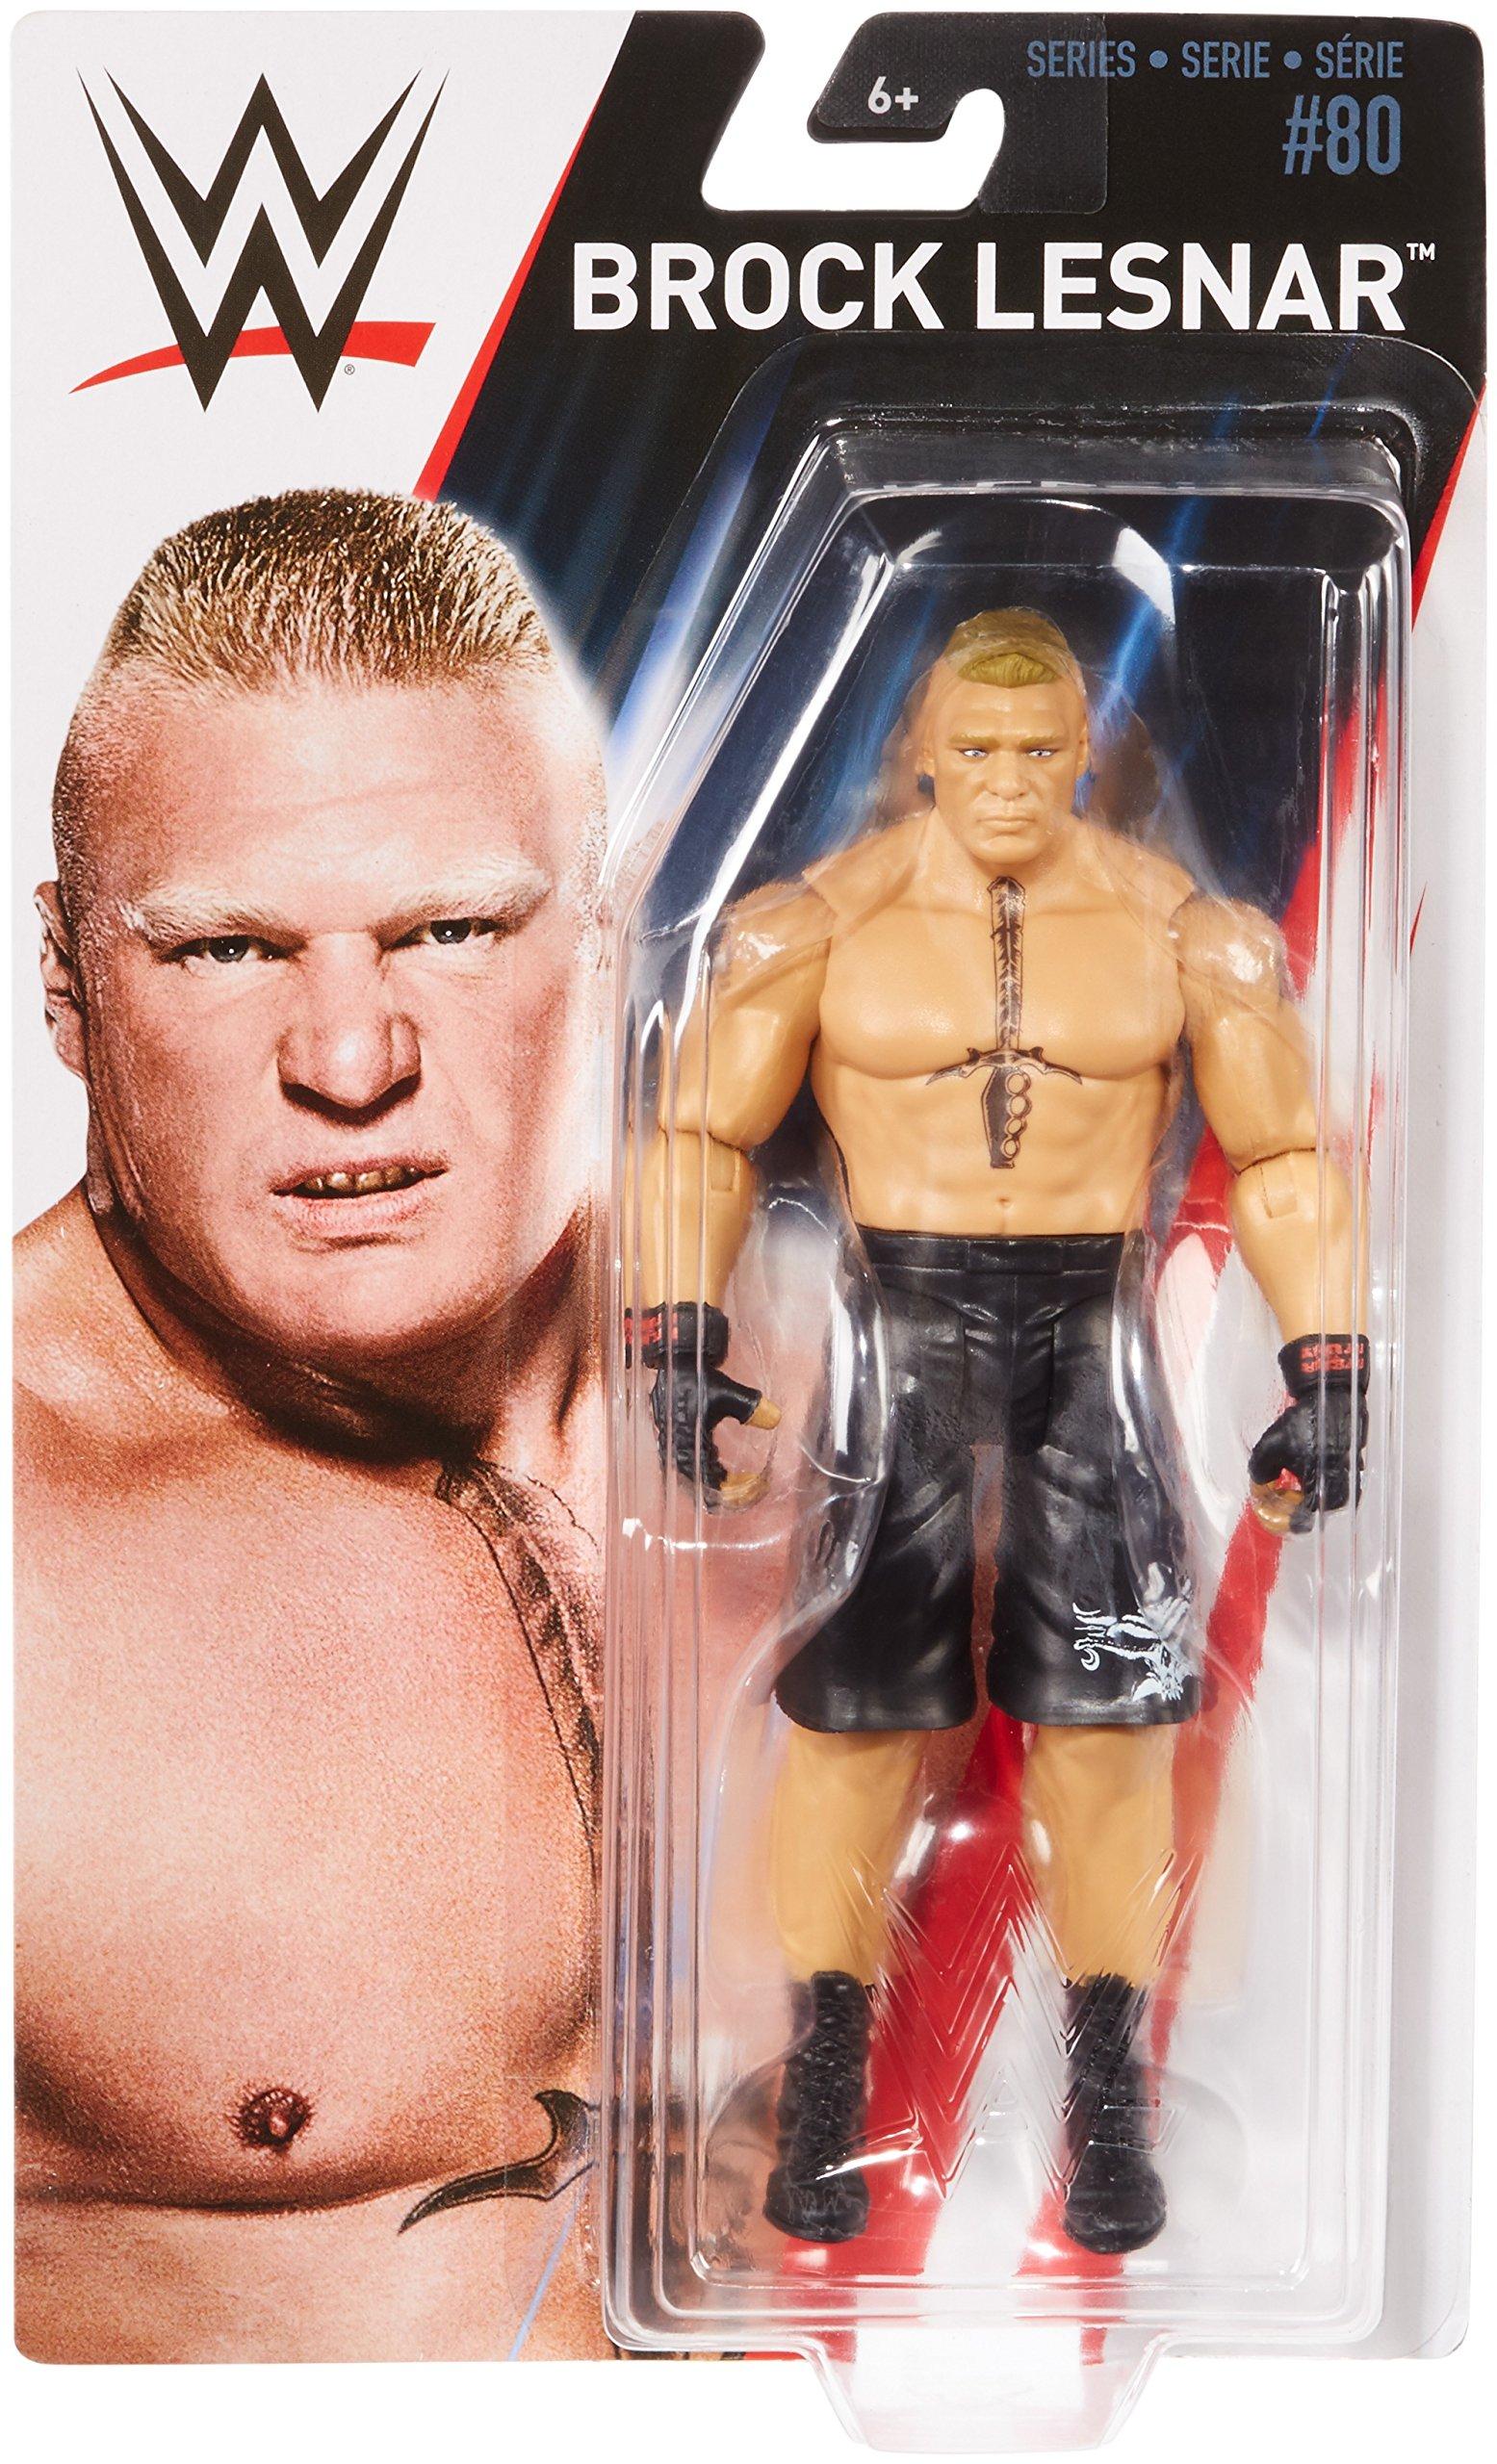 6 WWE Series #80 Chris Jericho Action Figure